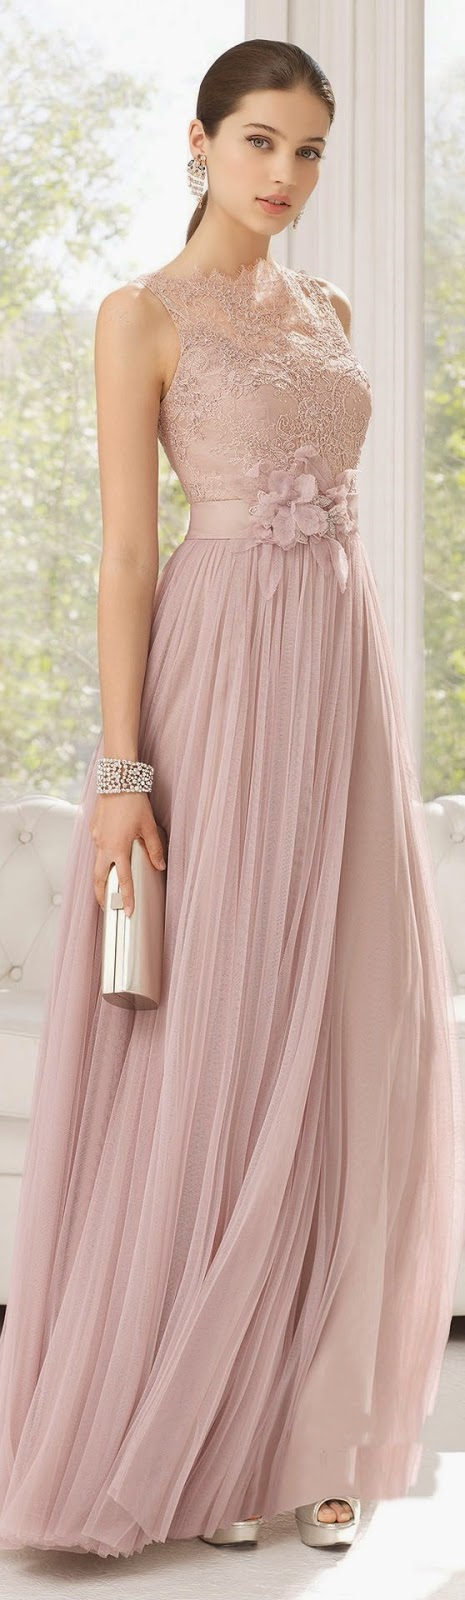 Top 5 Elegant dress